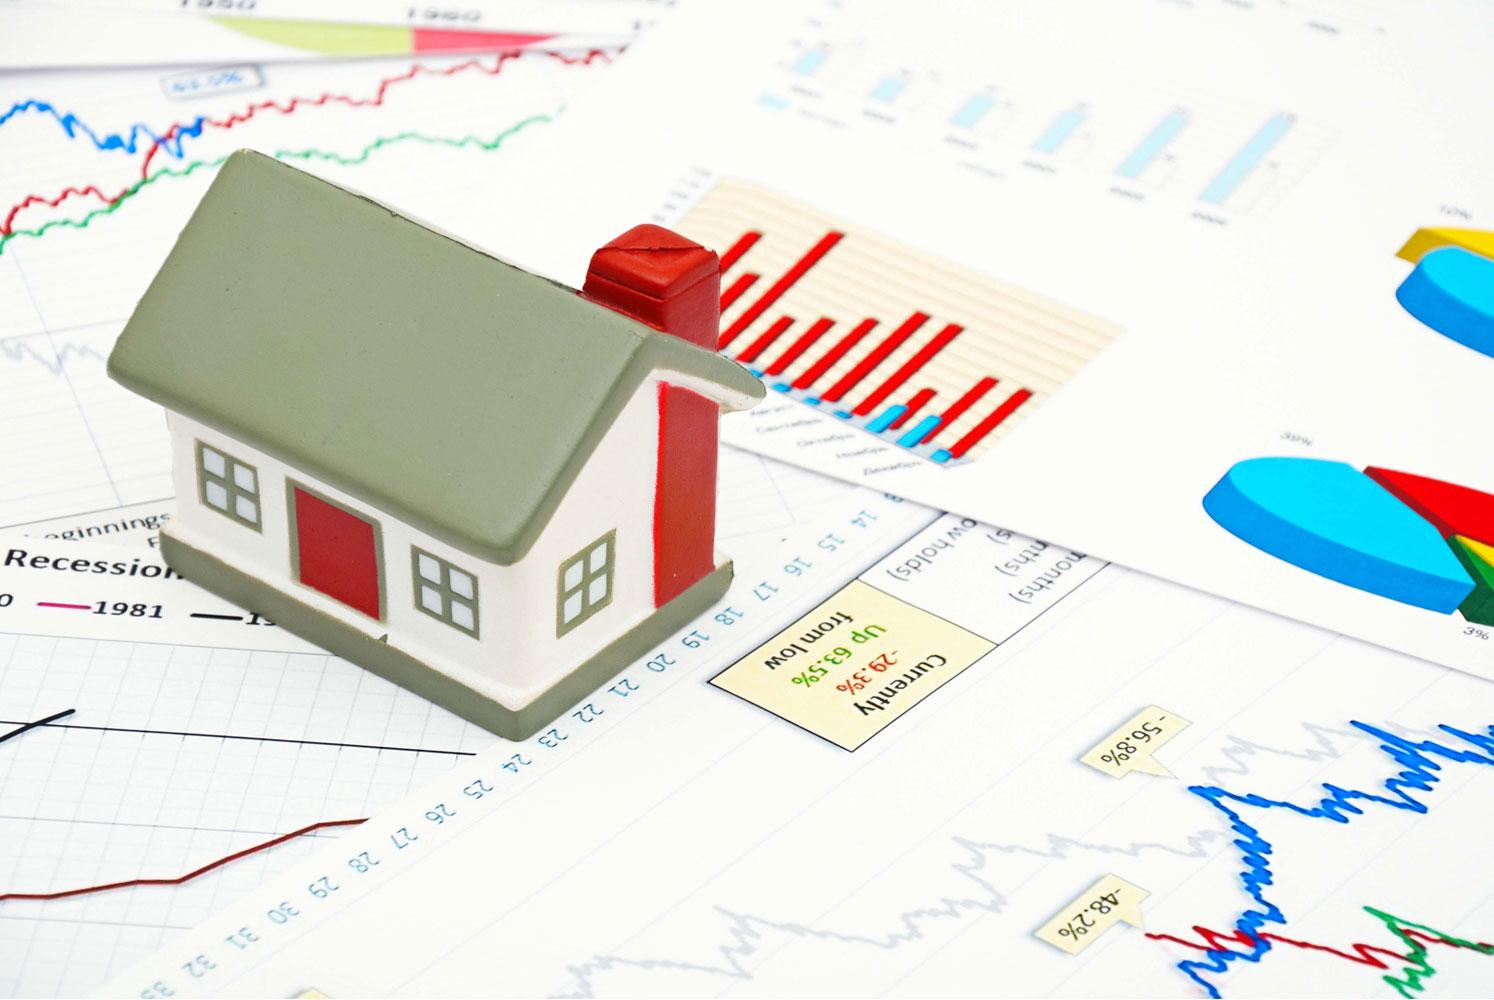 Mercat residencial al 2015: torna l' interès (Informe PWC)